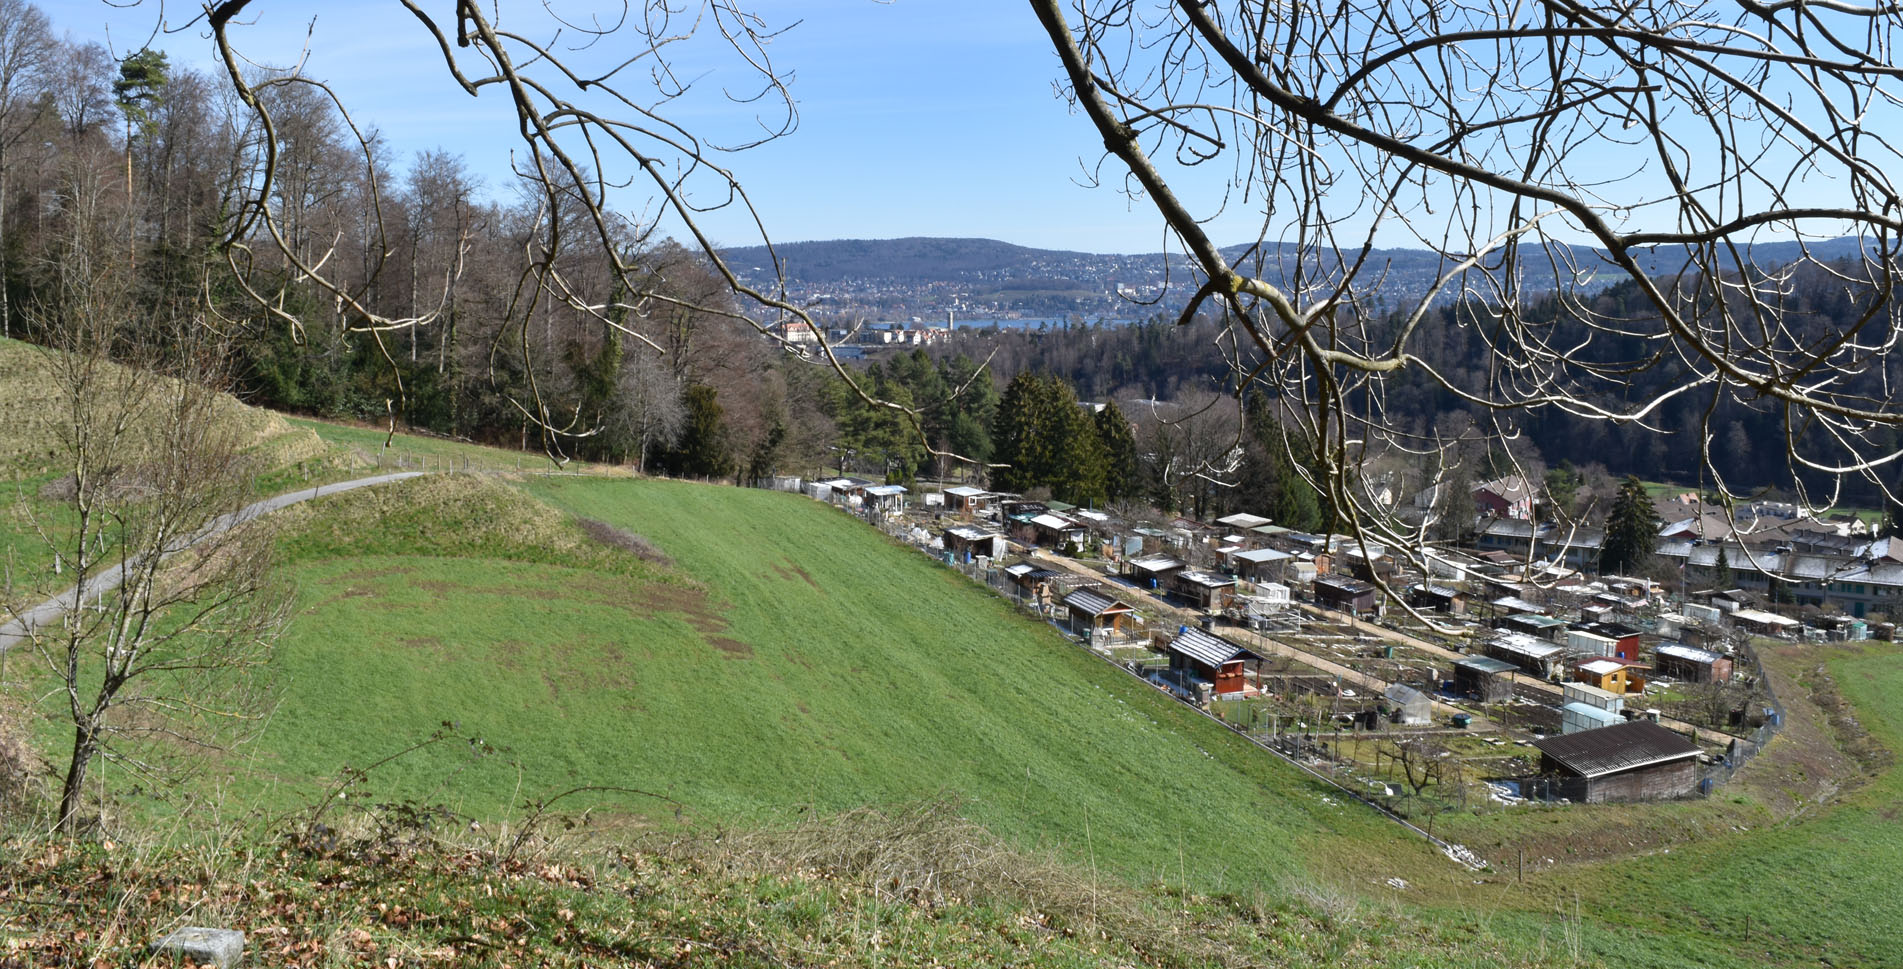 Wanderung von Zürich Leimbach im Sihltal, am Fusse des Uetlibergs, via Leimbihof nach Sood Oberleimbach und zurück zum Ausgangspunkt an der Sihl entlang, vorbei an schönen Feuerstellen